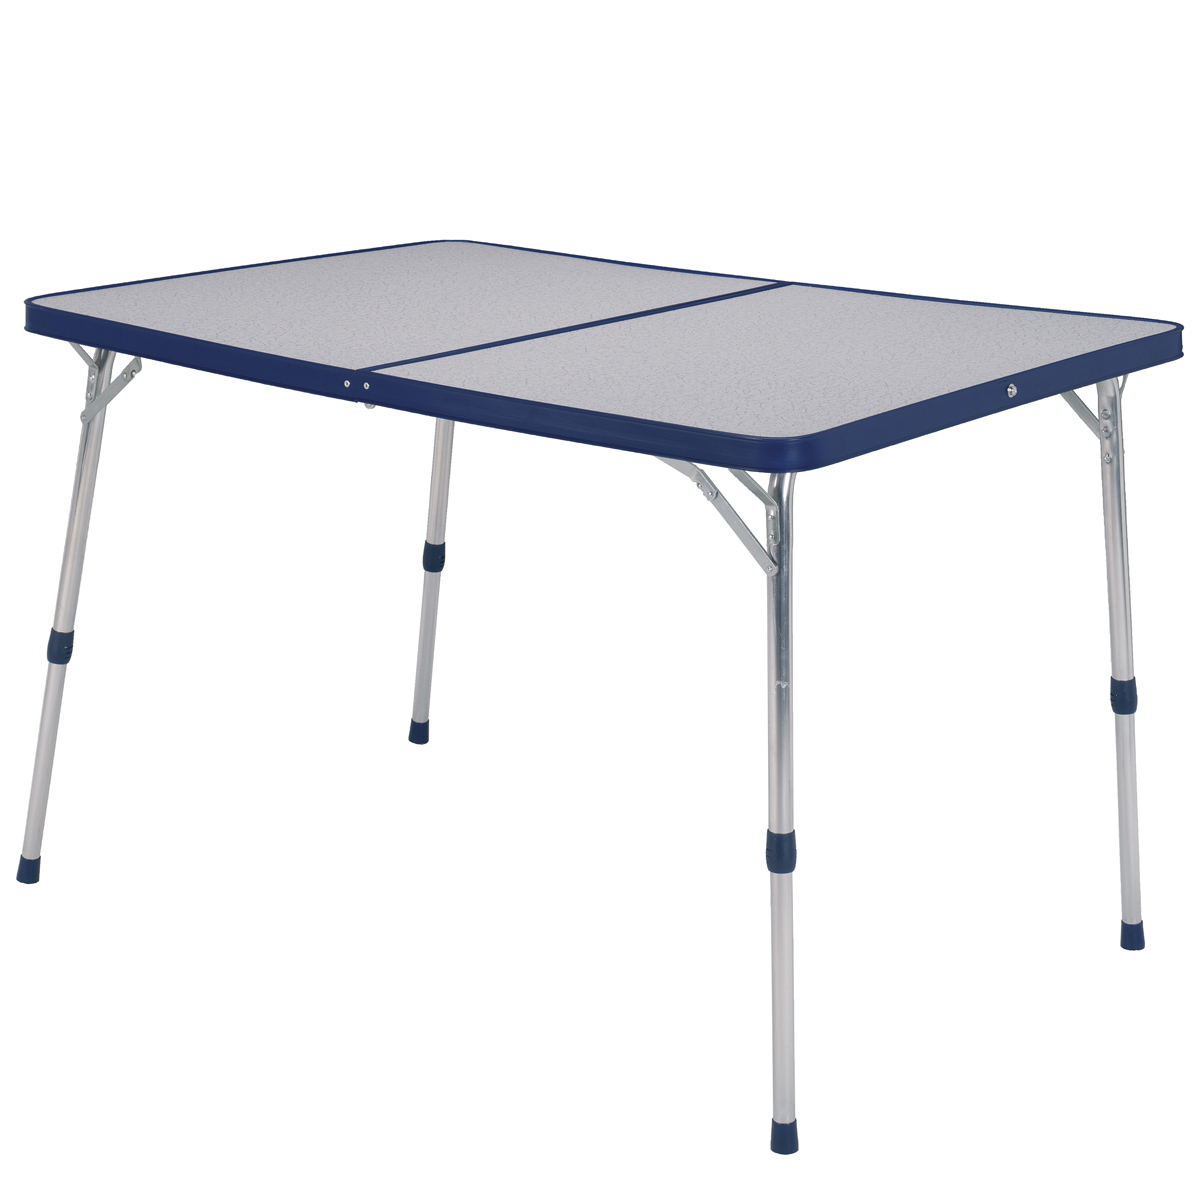 Mesa al 253 crespo - Indual mobiliario ...